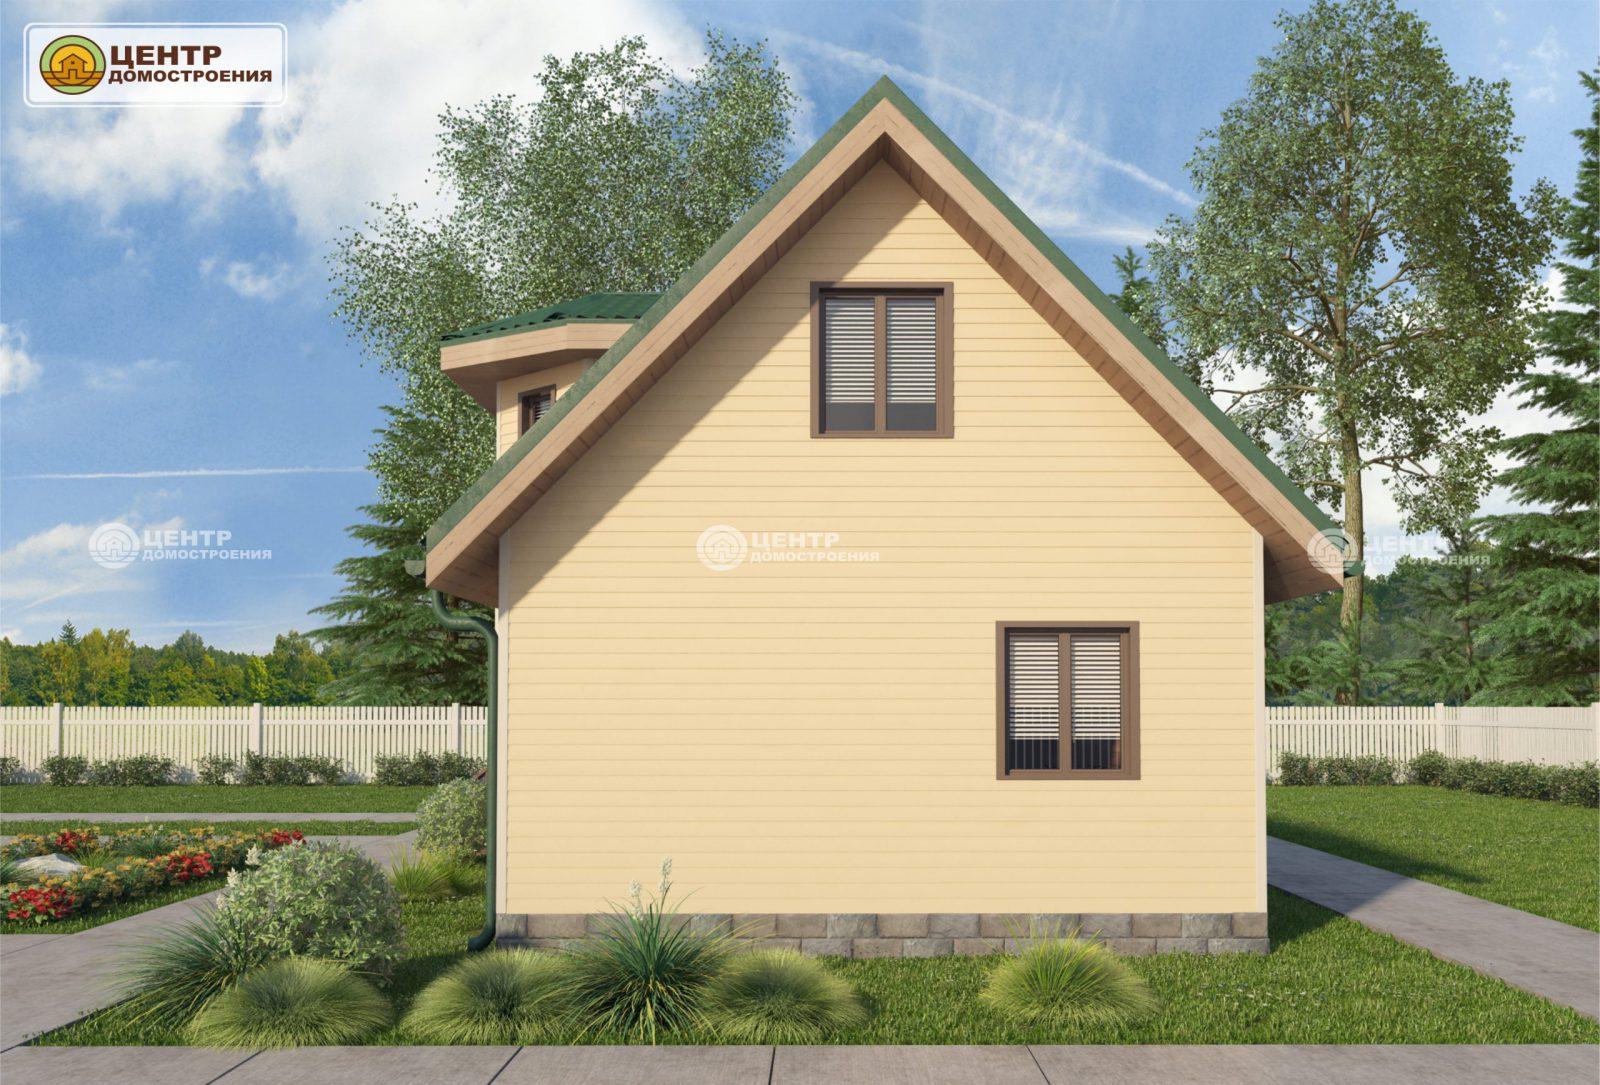 Проект дома 7 на 9 с мансардой